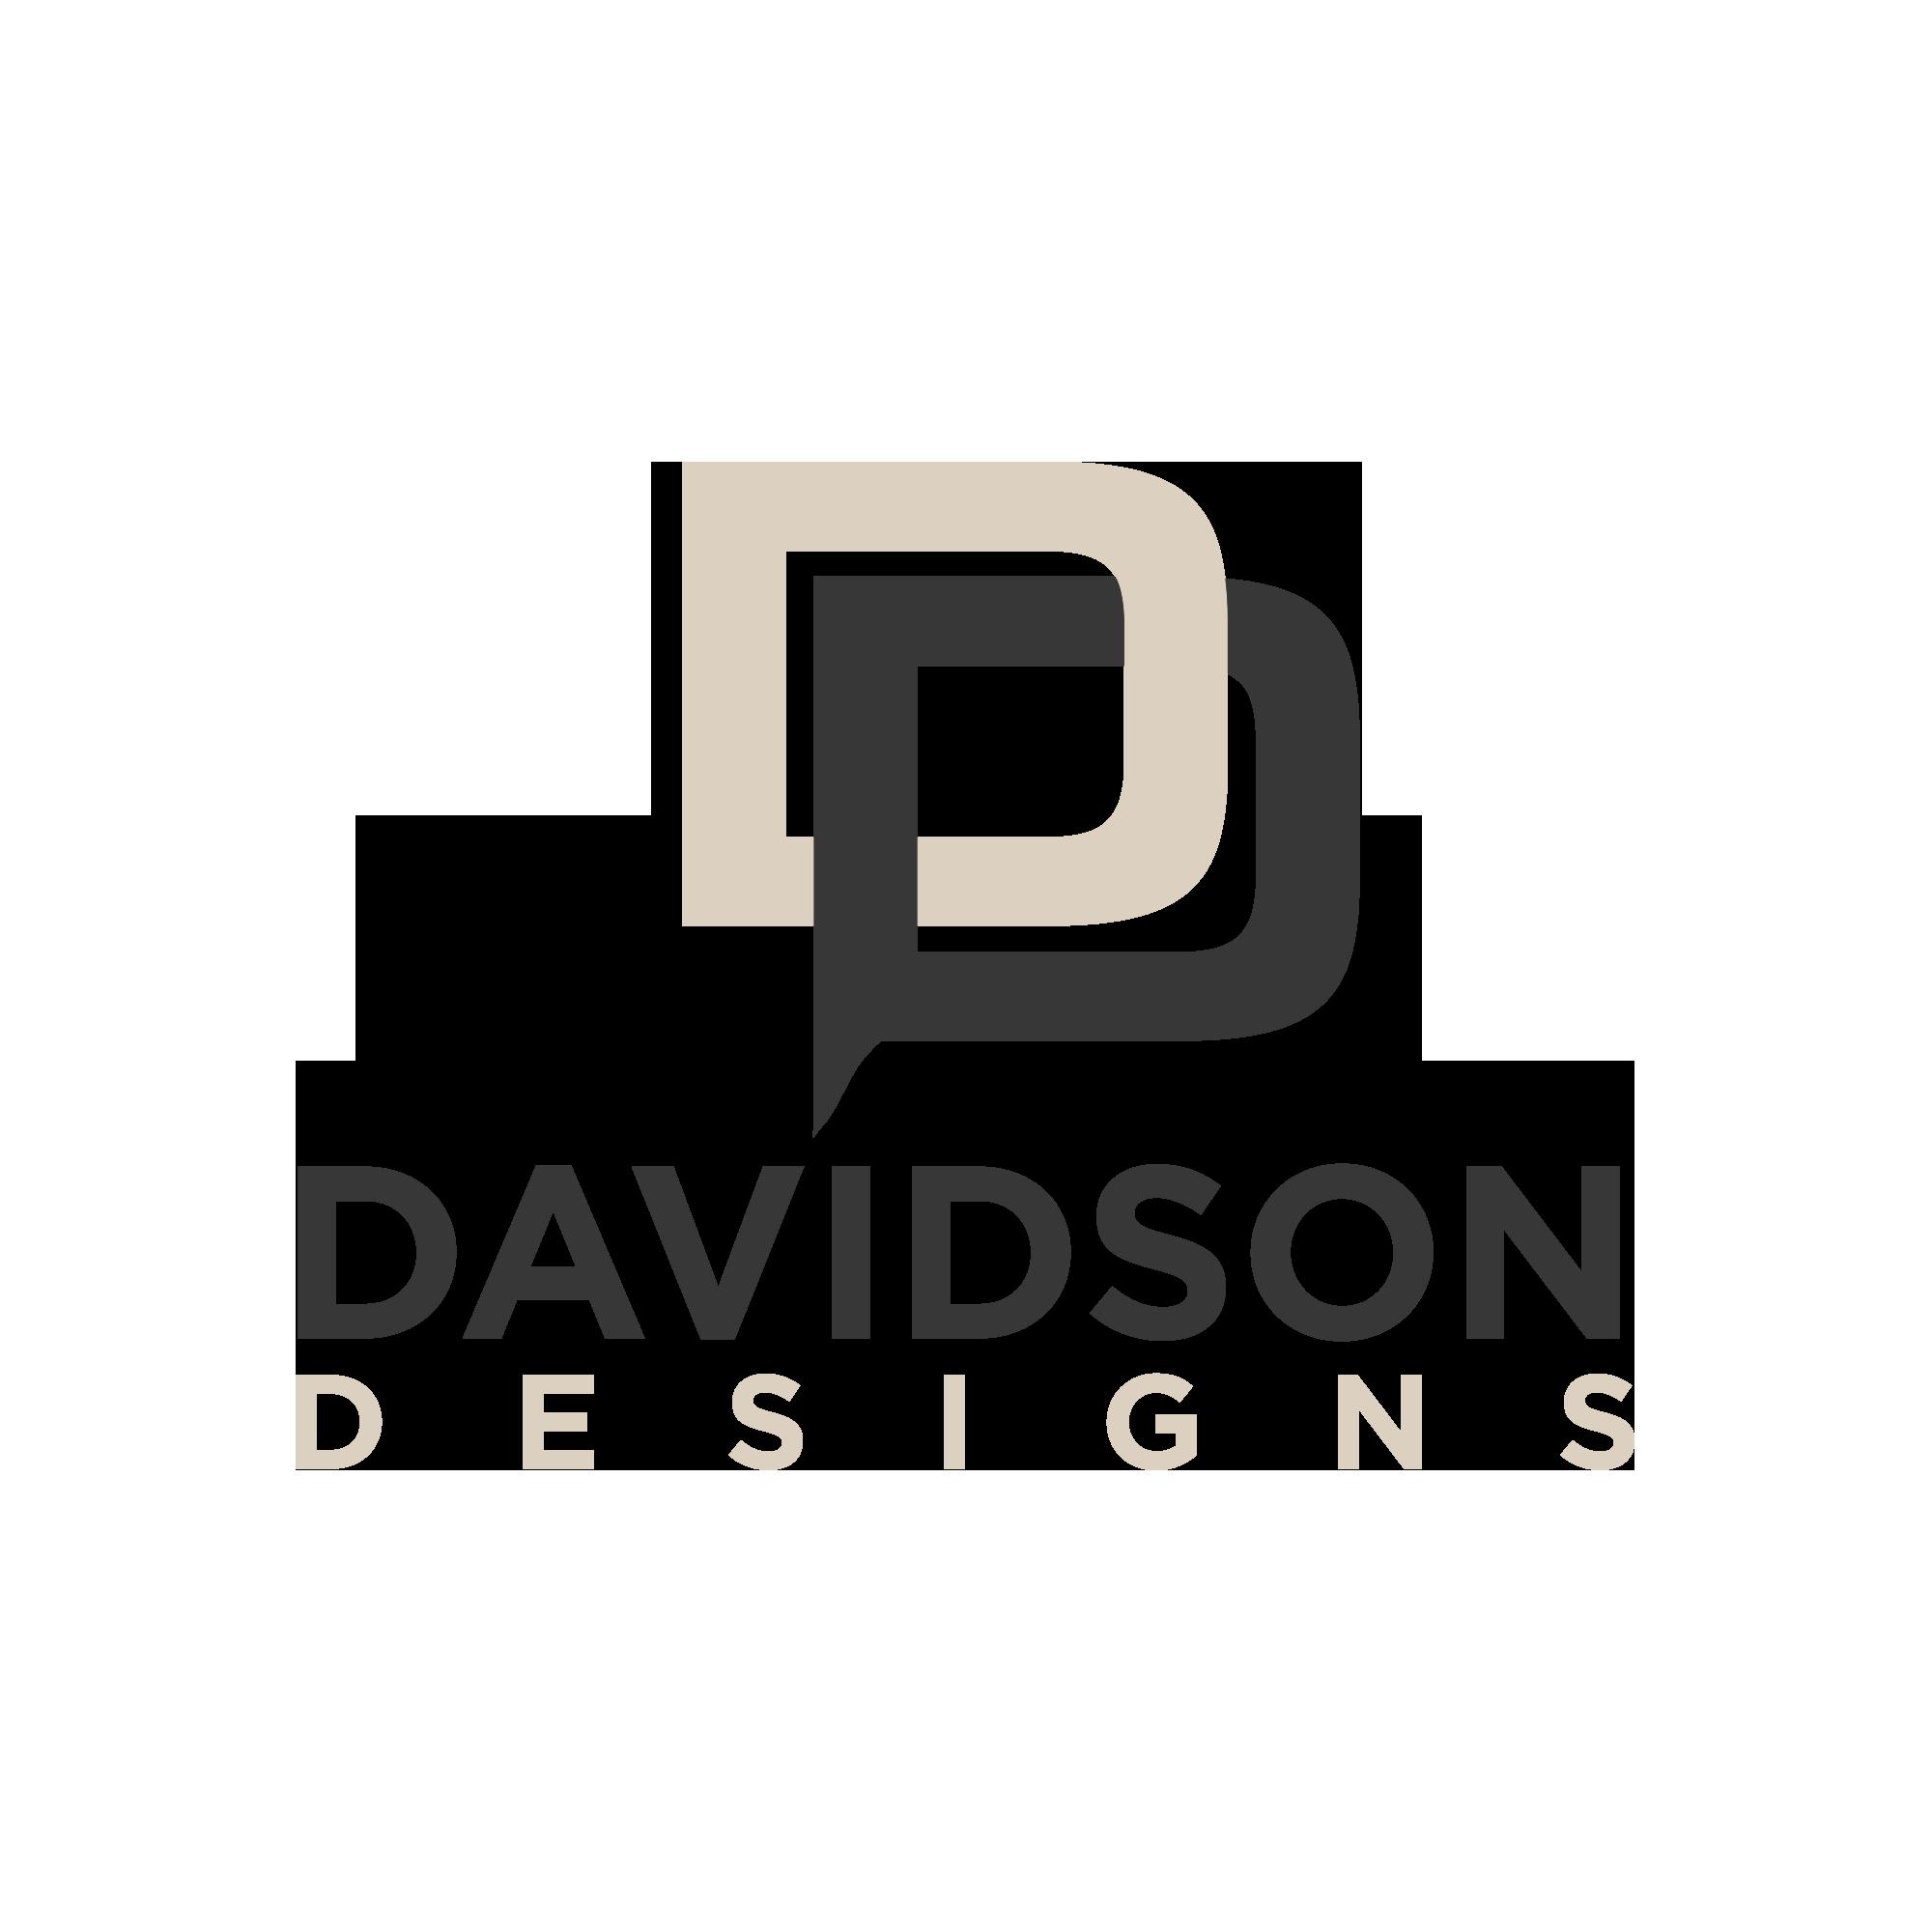 Davidson Designs